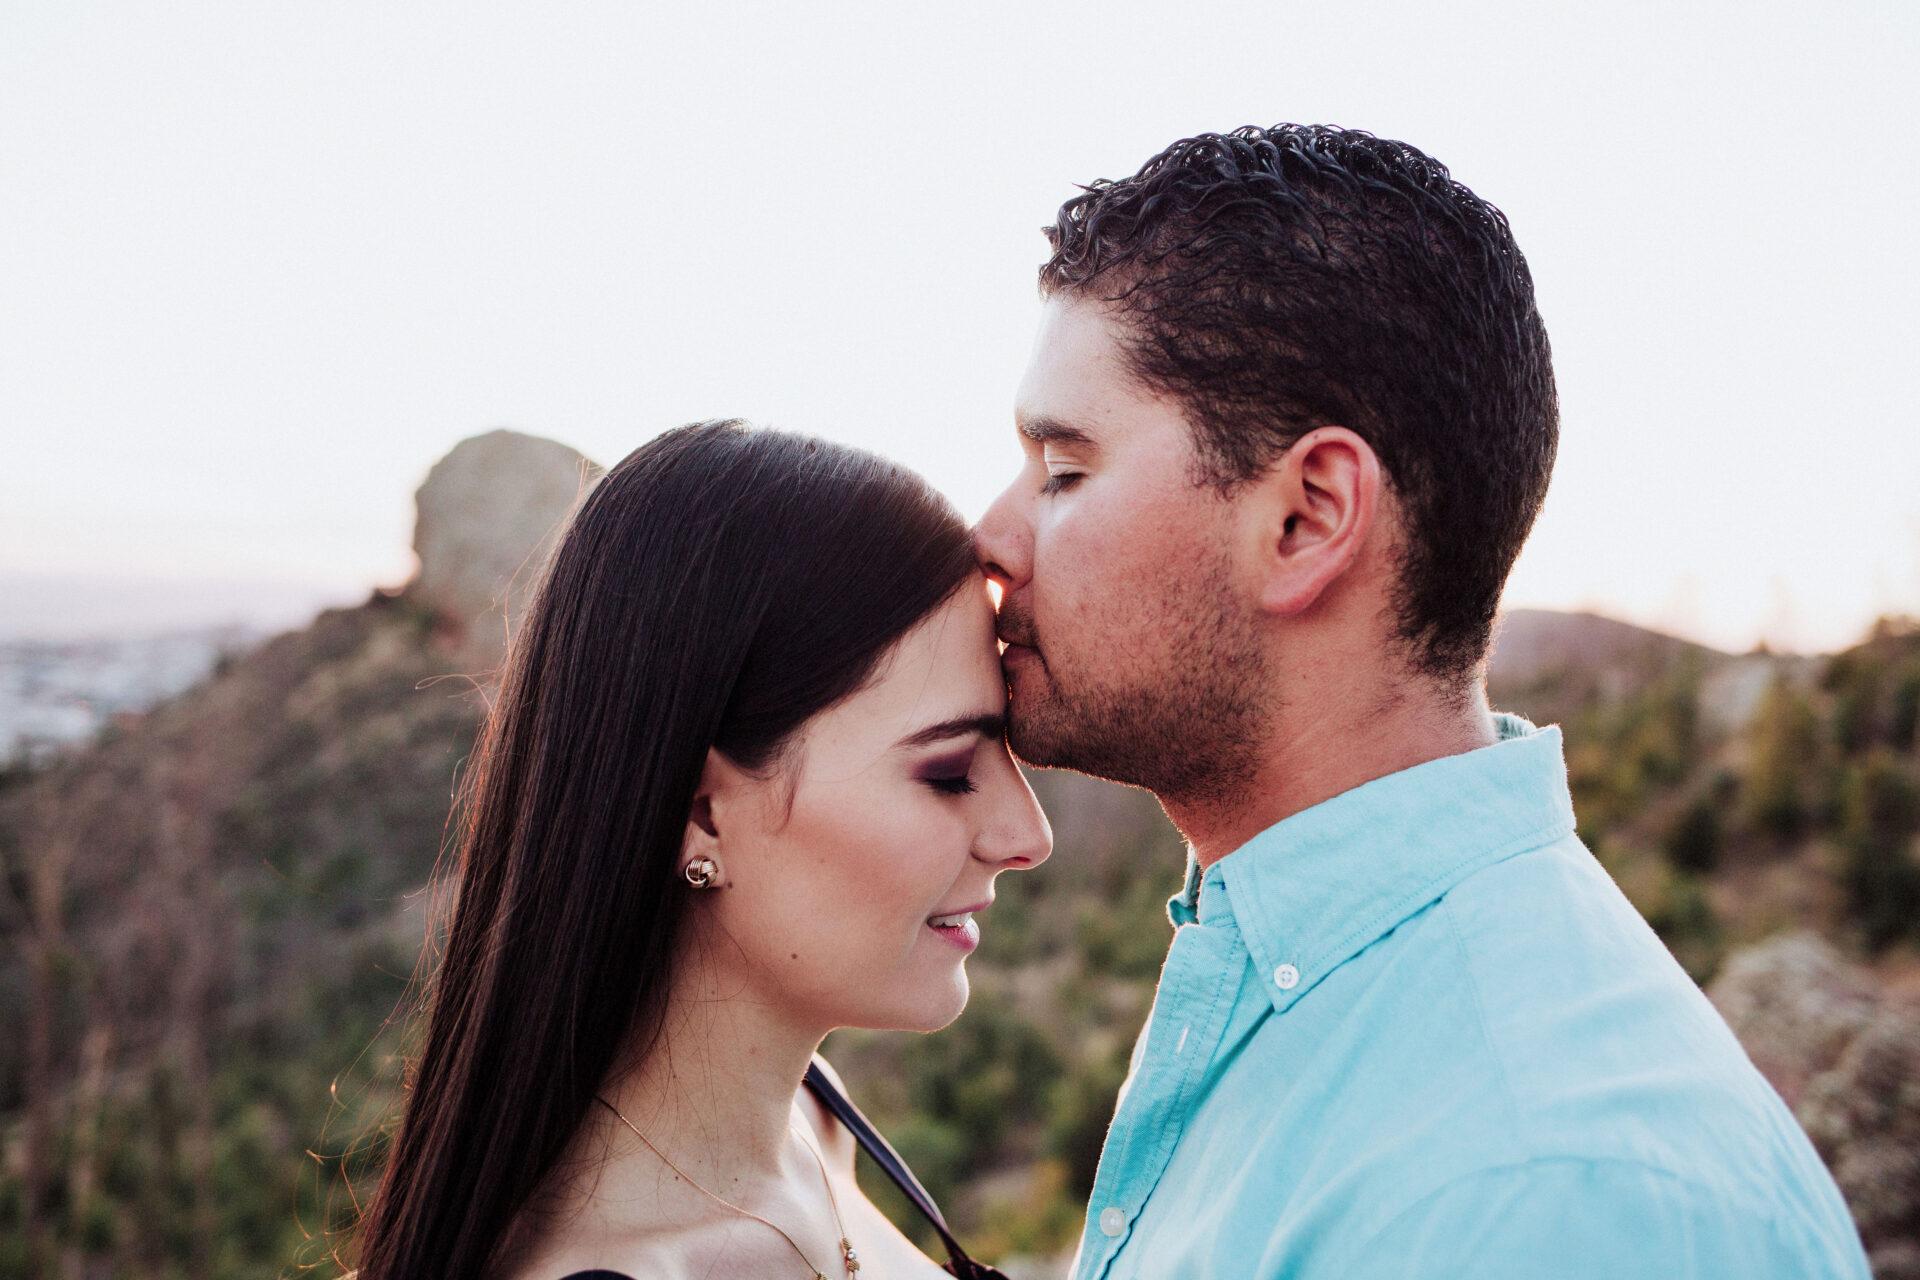 javier_noriega_fotografo_bodas_save_the_date_preboda_zacatecas_wedding_photographer21